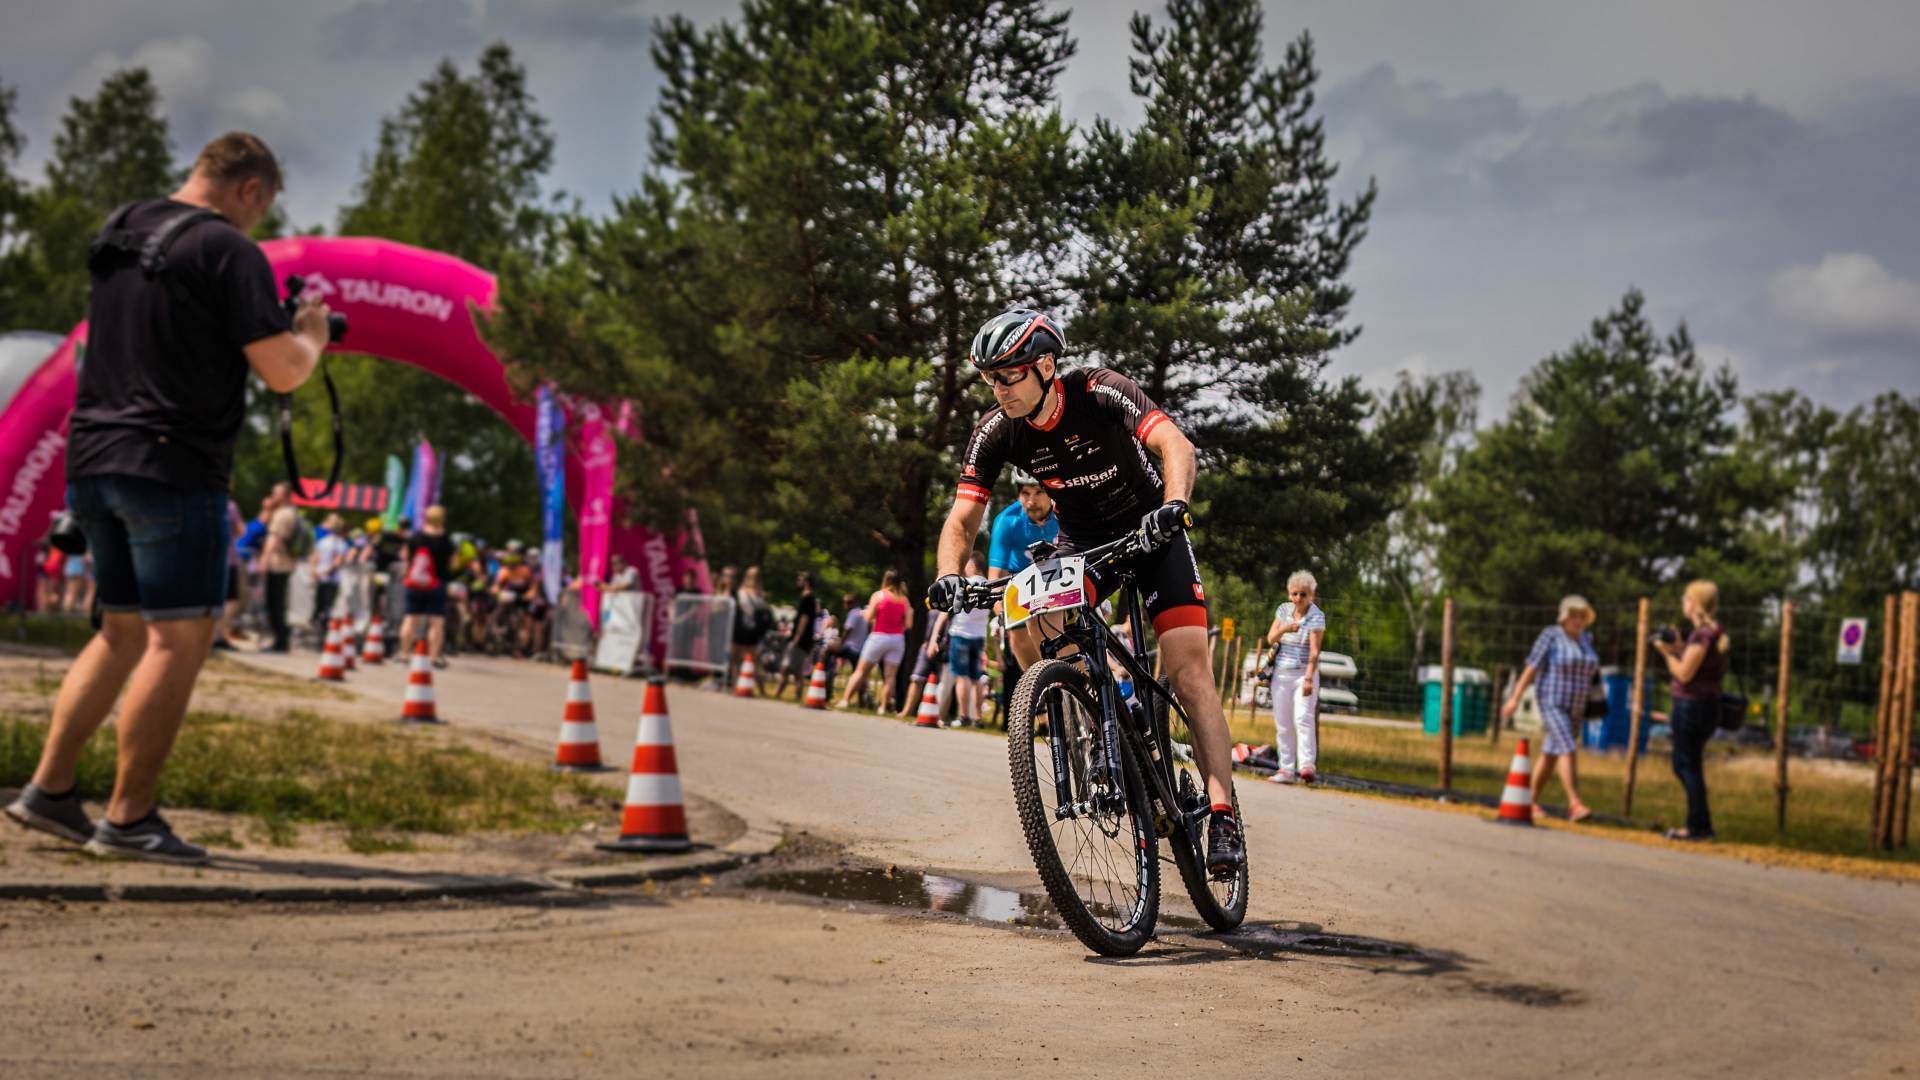 wyscig-rowerow-gorskich-0057